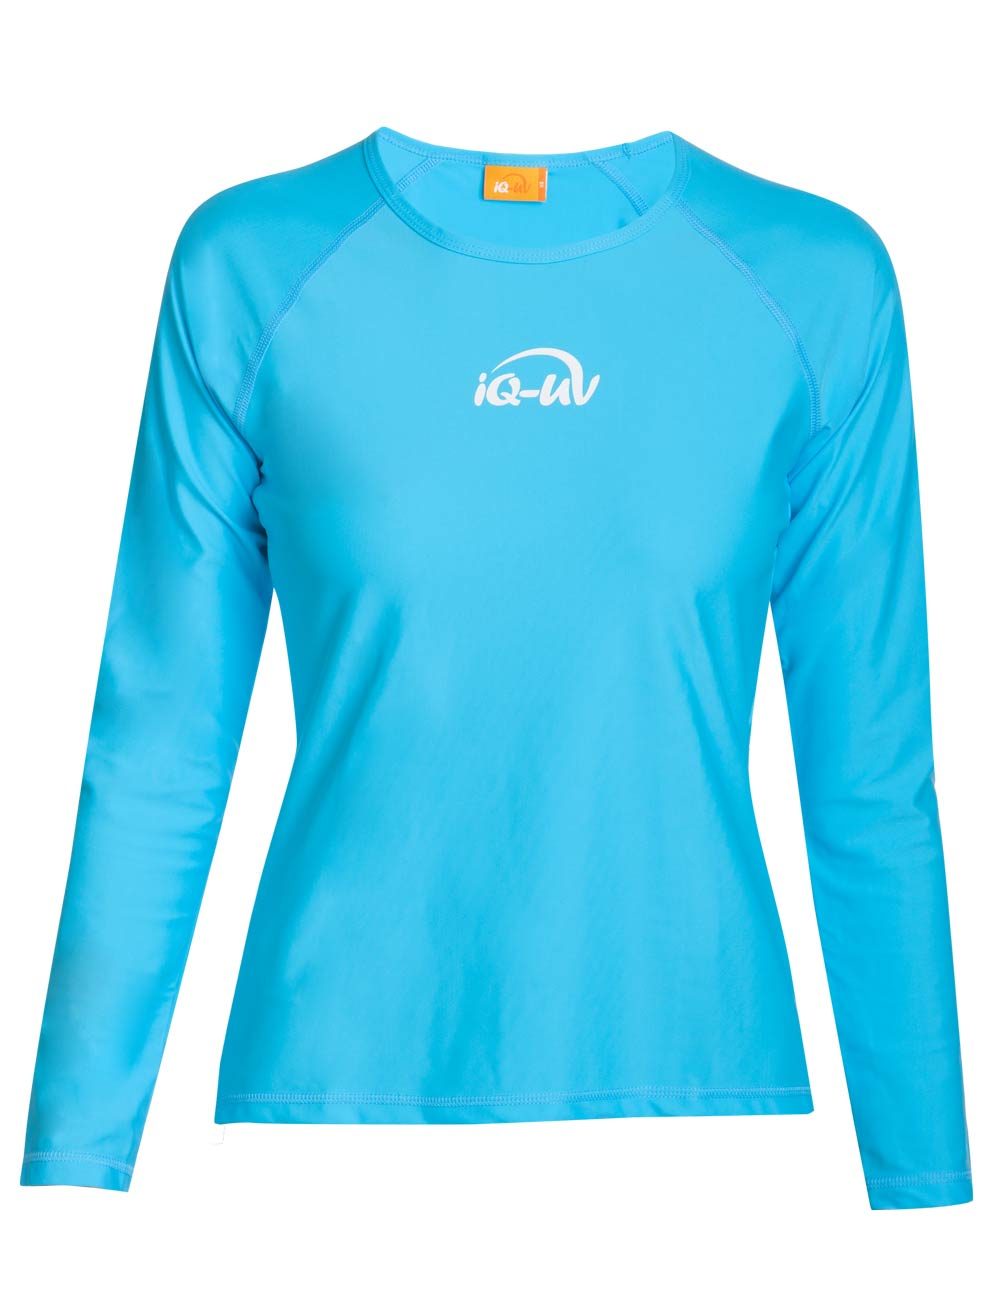 IQ-UV Damen T-Shirt langarm | UV-Schutz 300 | bequem ...